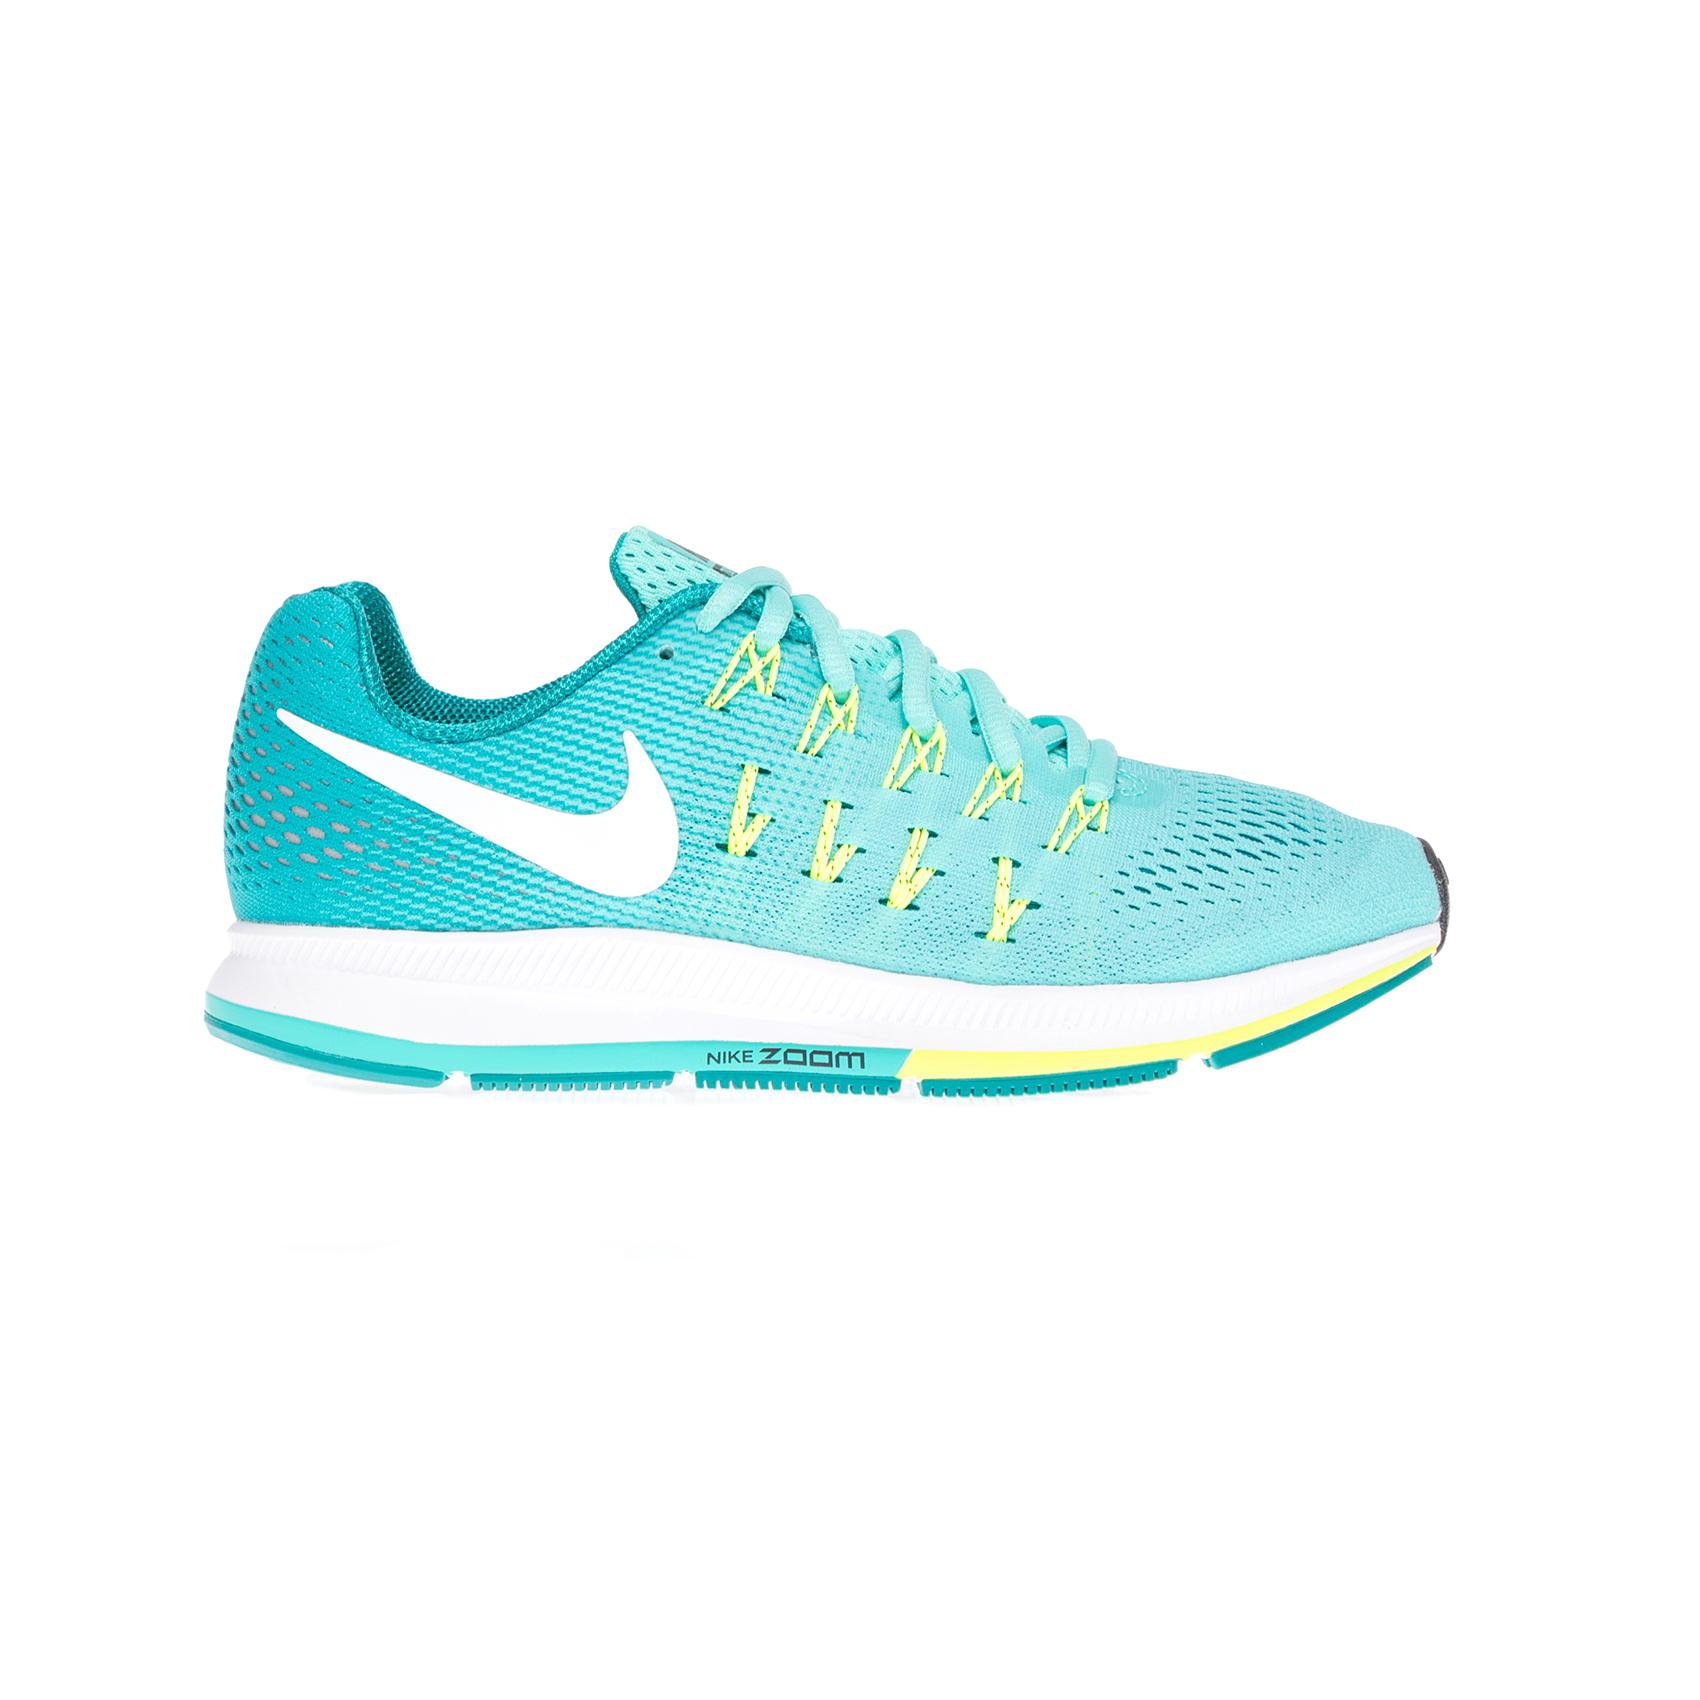 2118e20d1cc NIKE – Γυναικεία αθλητικά παπούτσια NIKE AIR ZOOM PEGASUS 33 μπλε